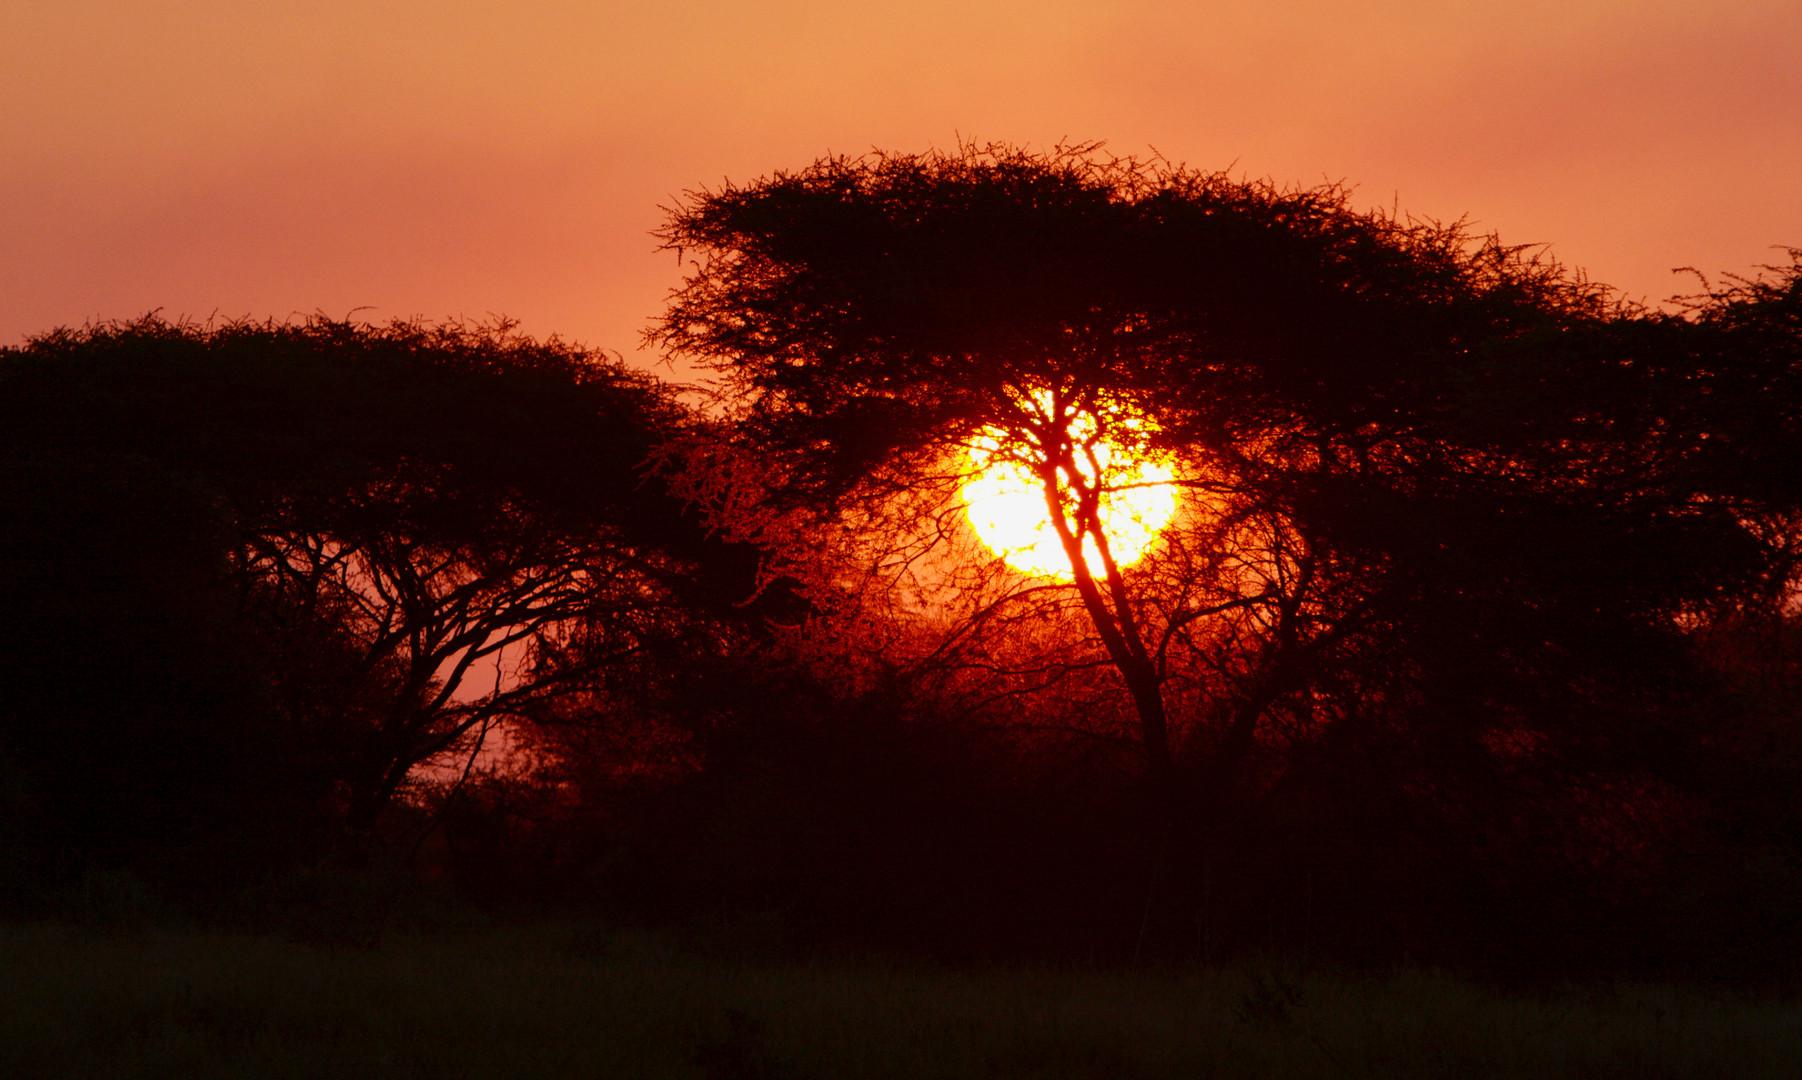 Sunset at Malilangwe